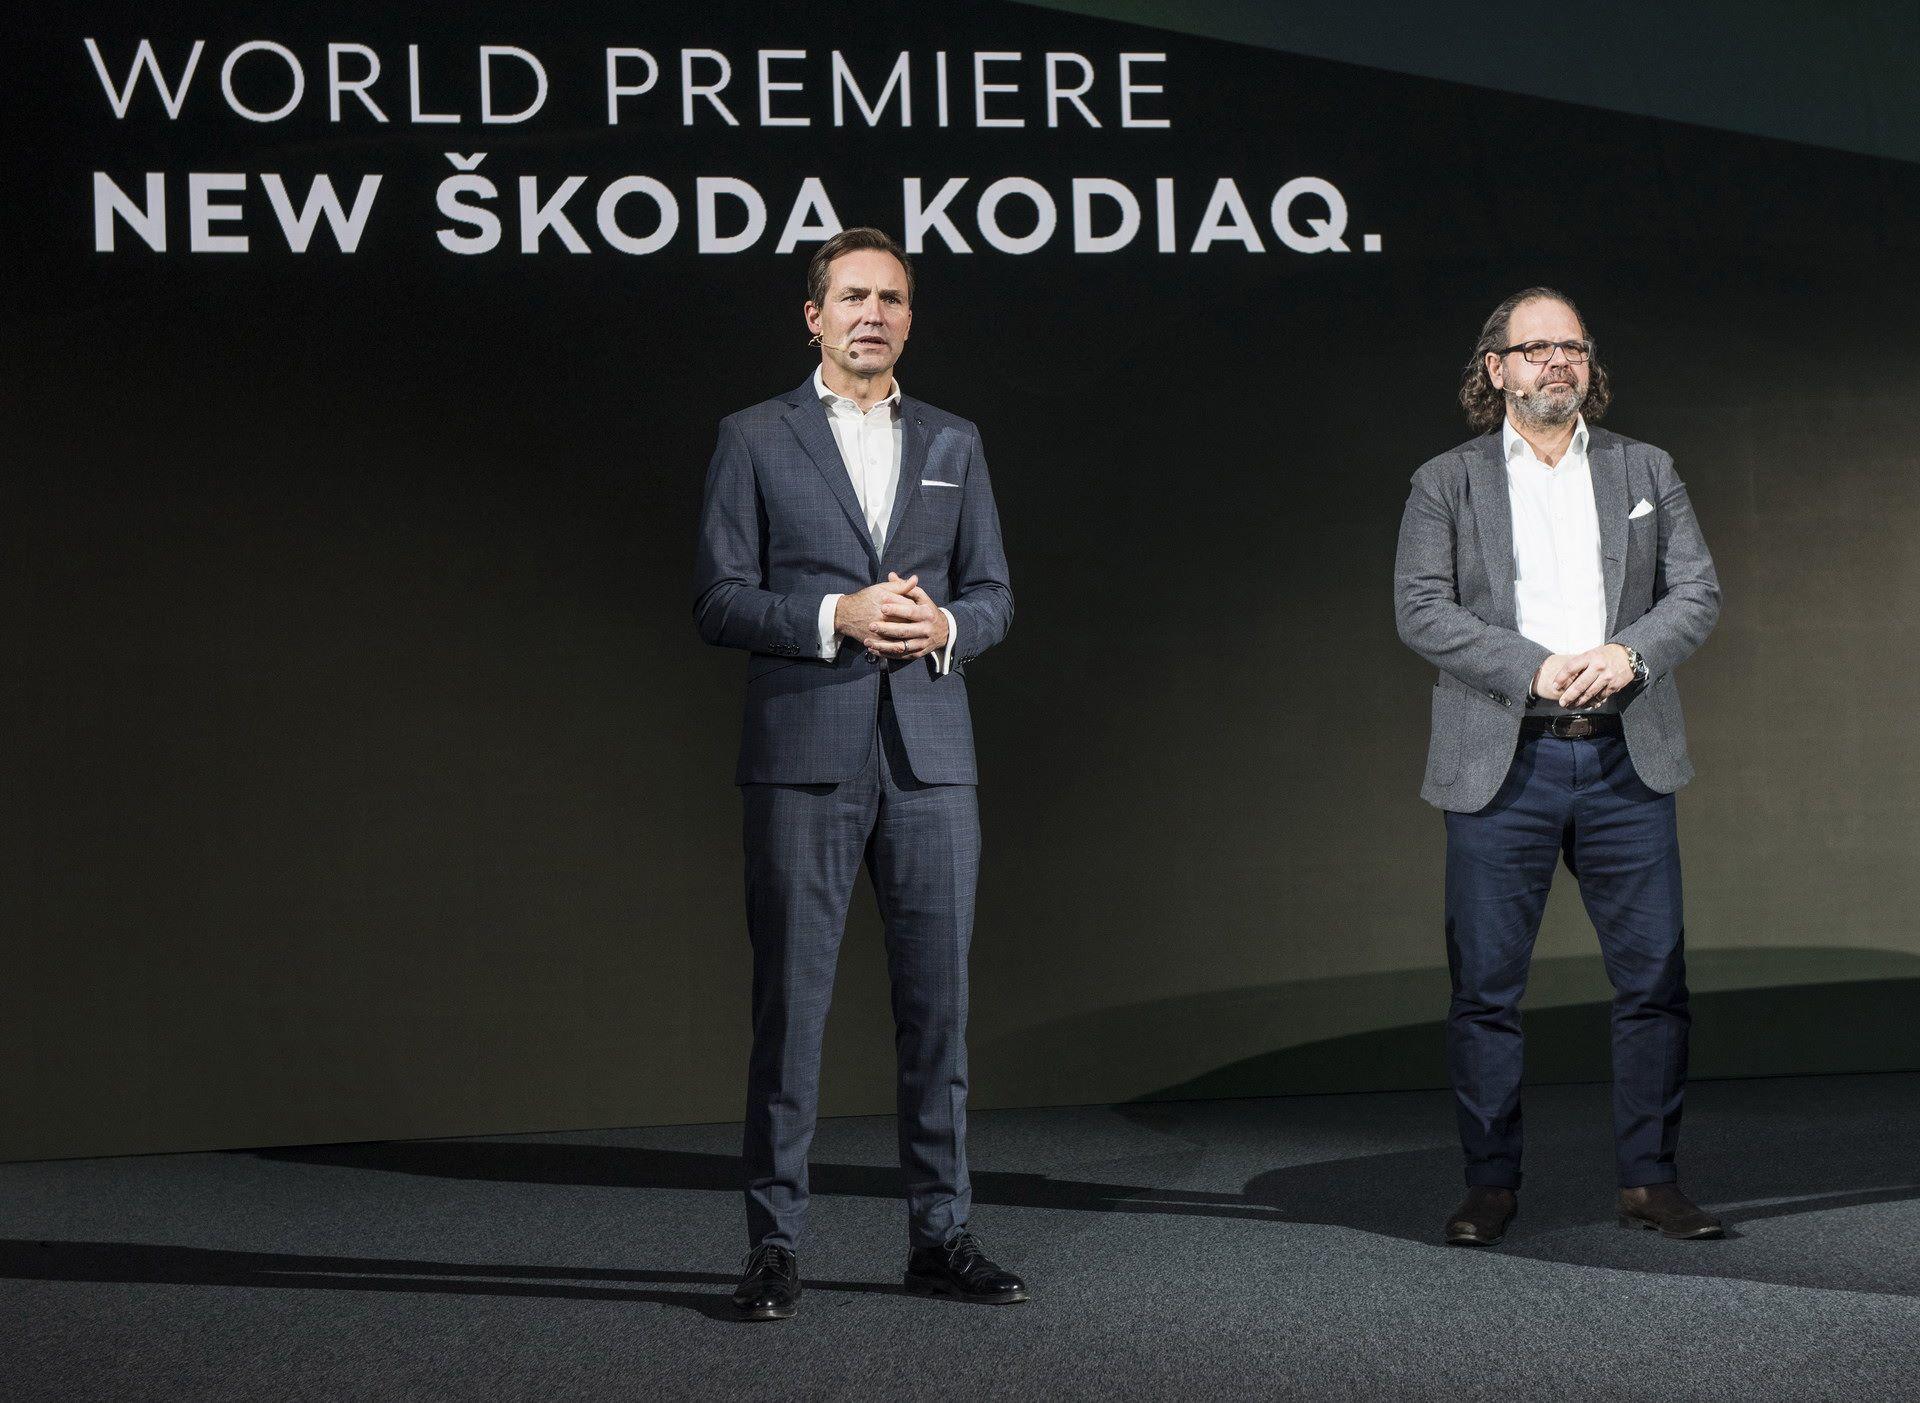 Skoda-Kodiaq-facelift-2021-80